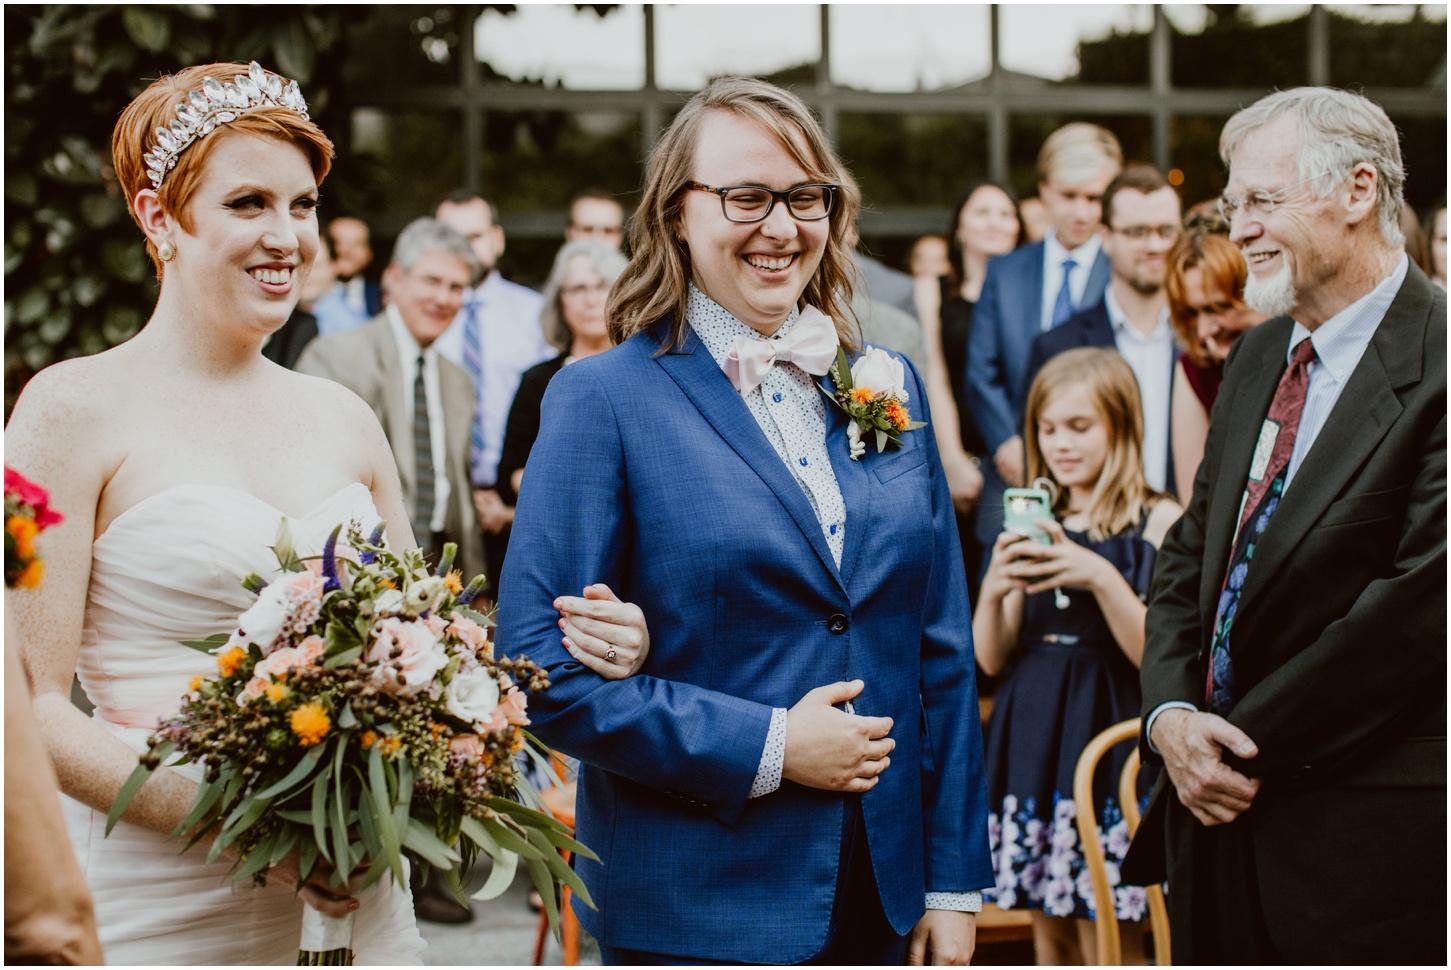 Smogshoppe-Wedding-S+C-Diana-Lake-Photography-397.jpg